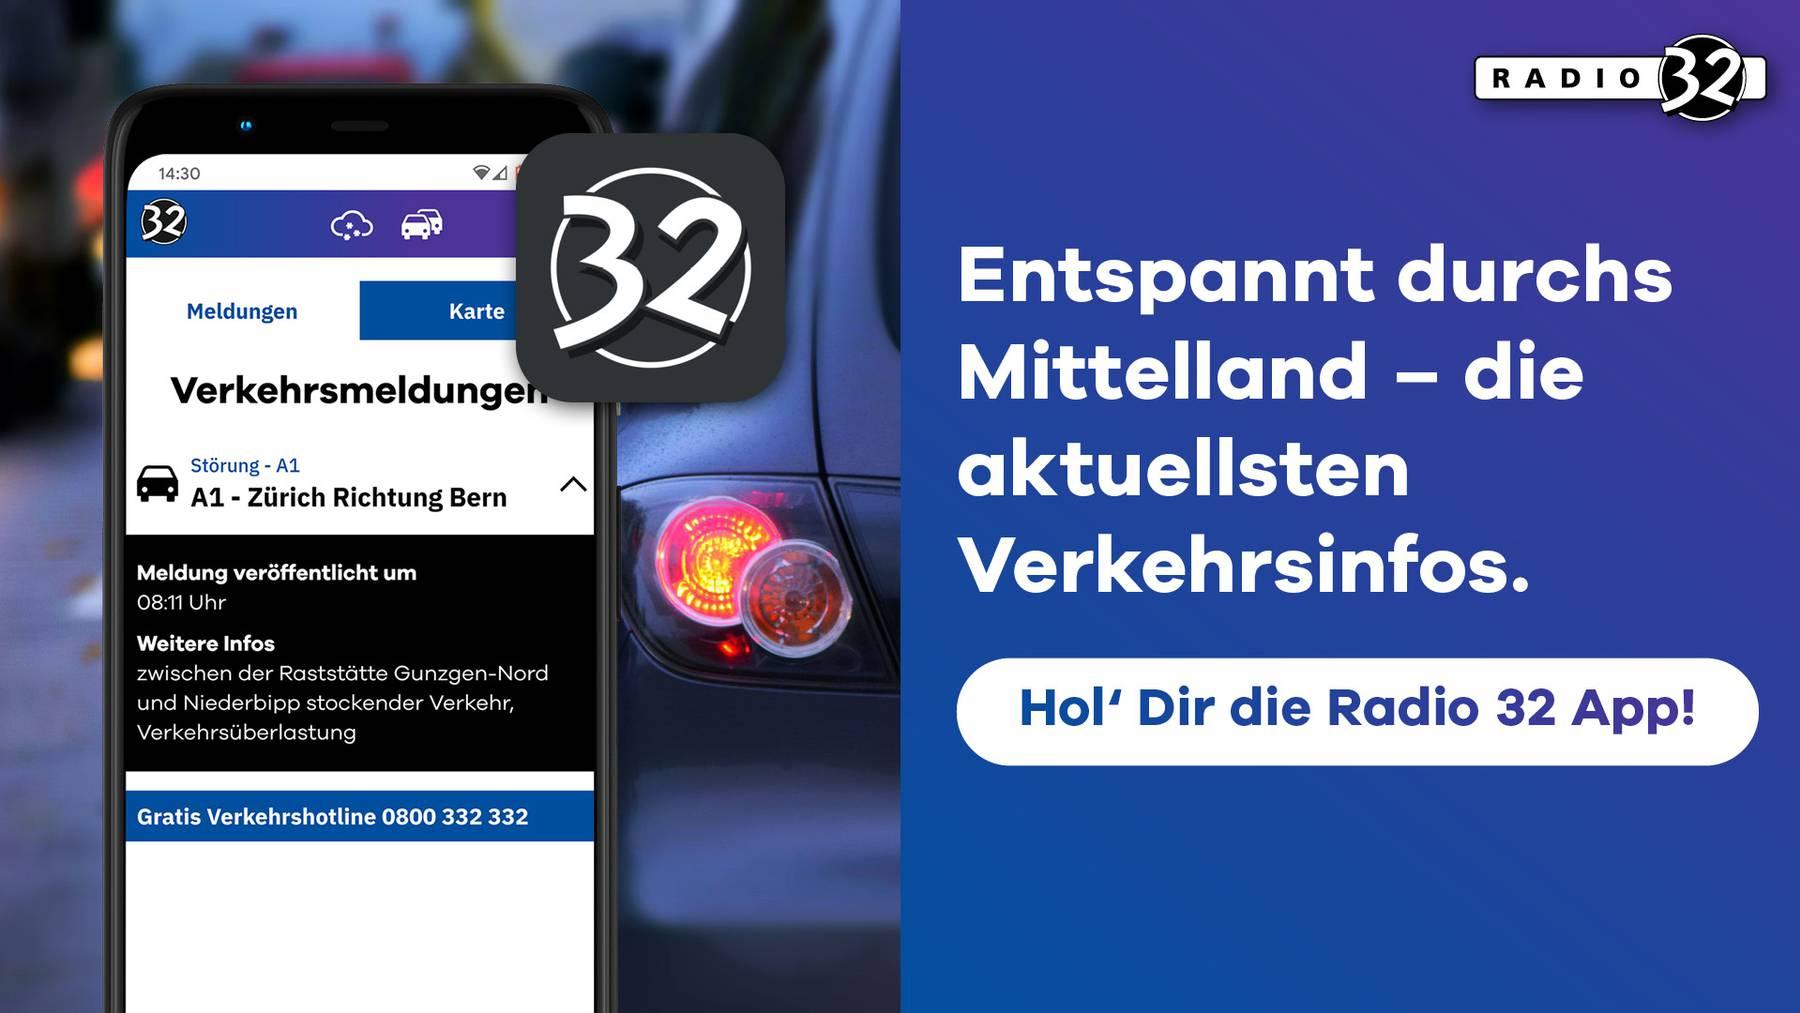 Radio 32 App